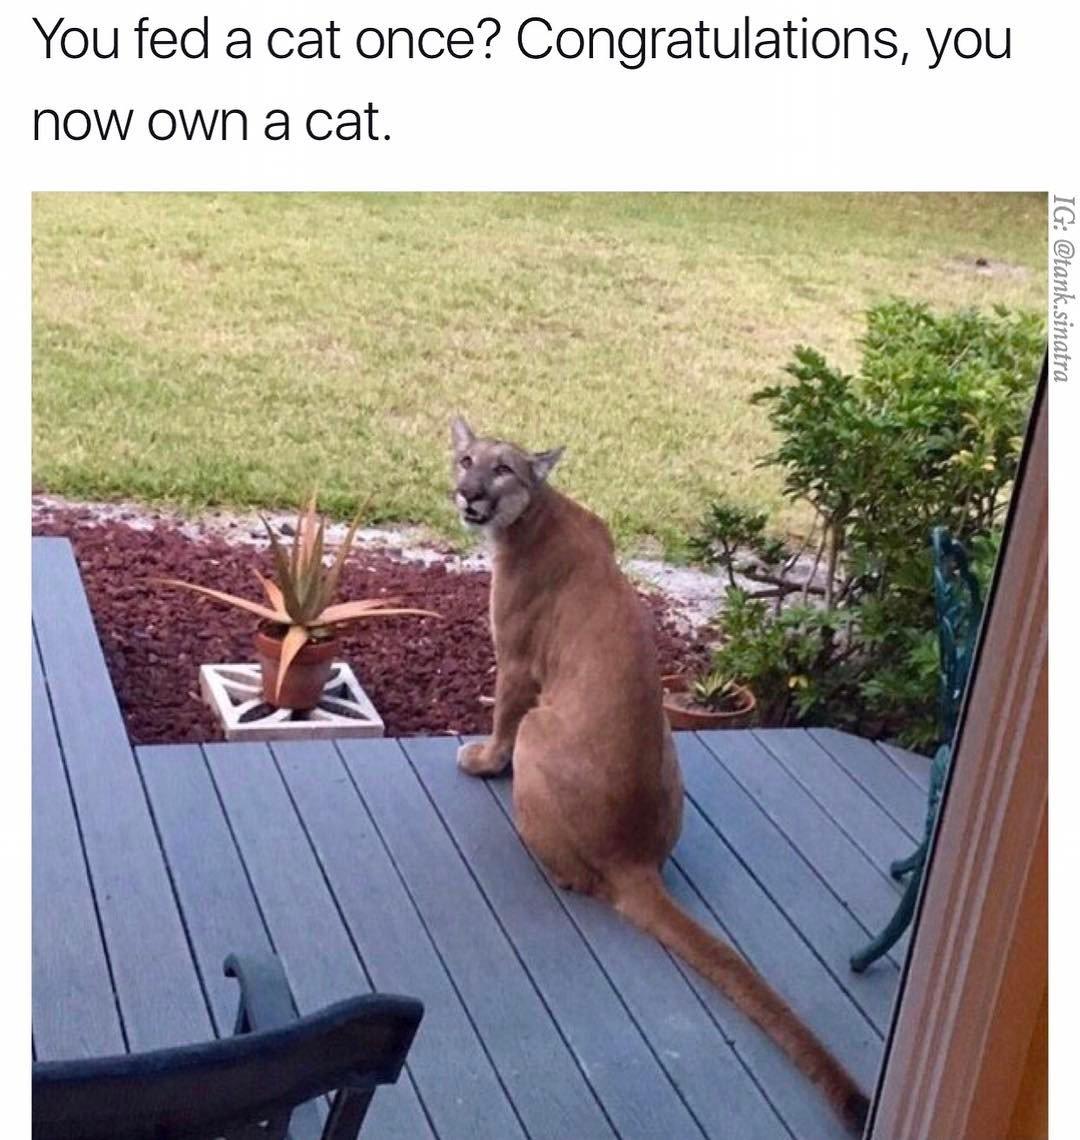 Never feed a stray cat...